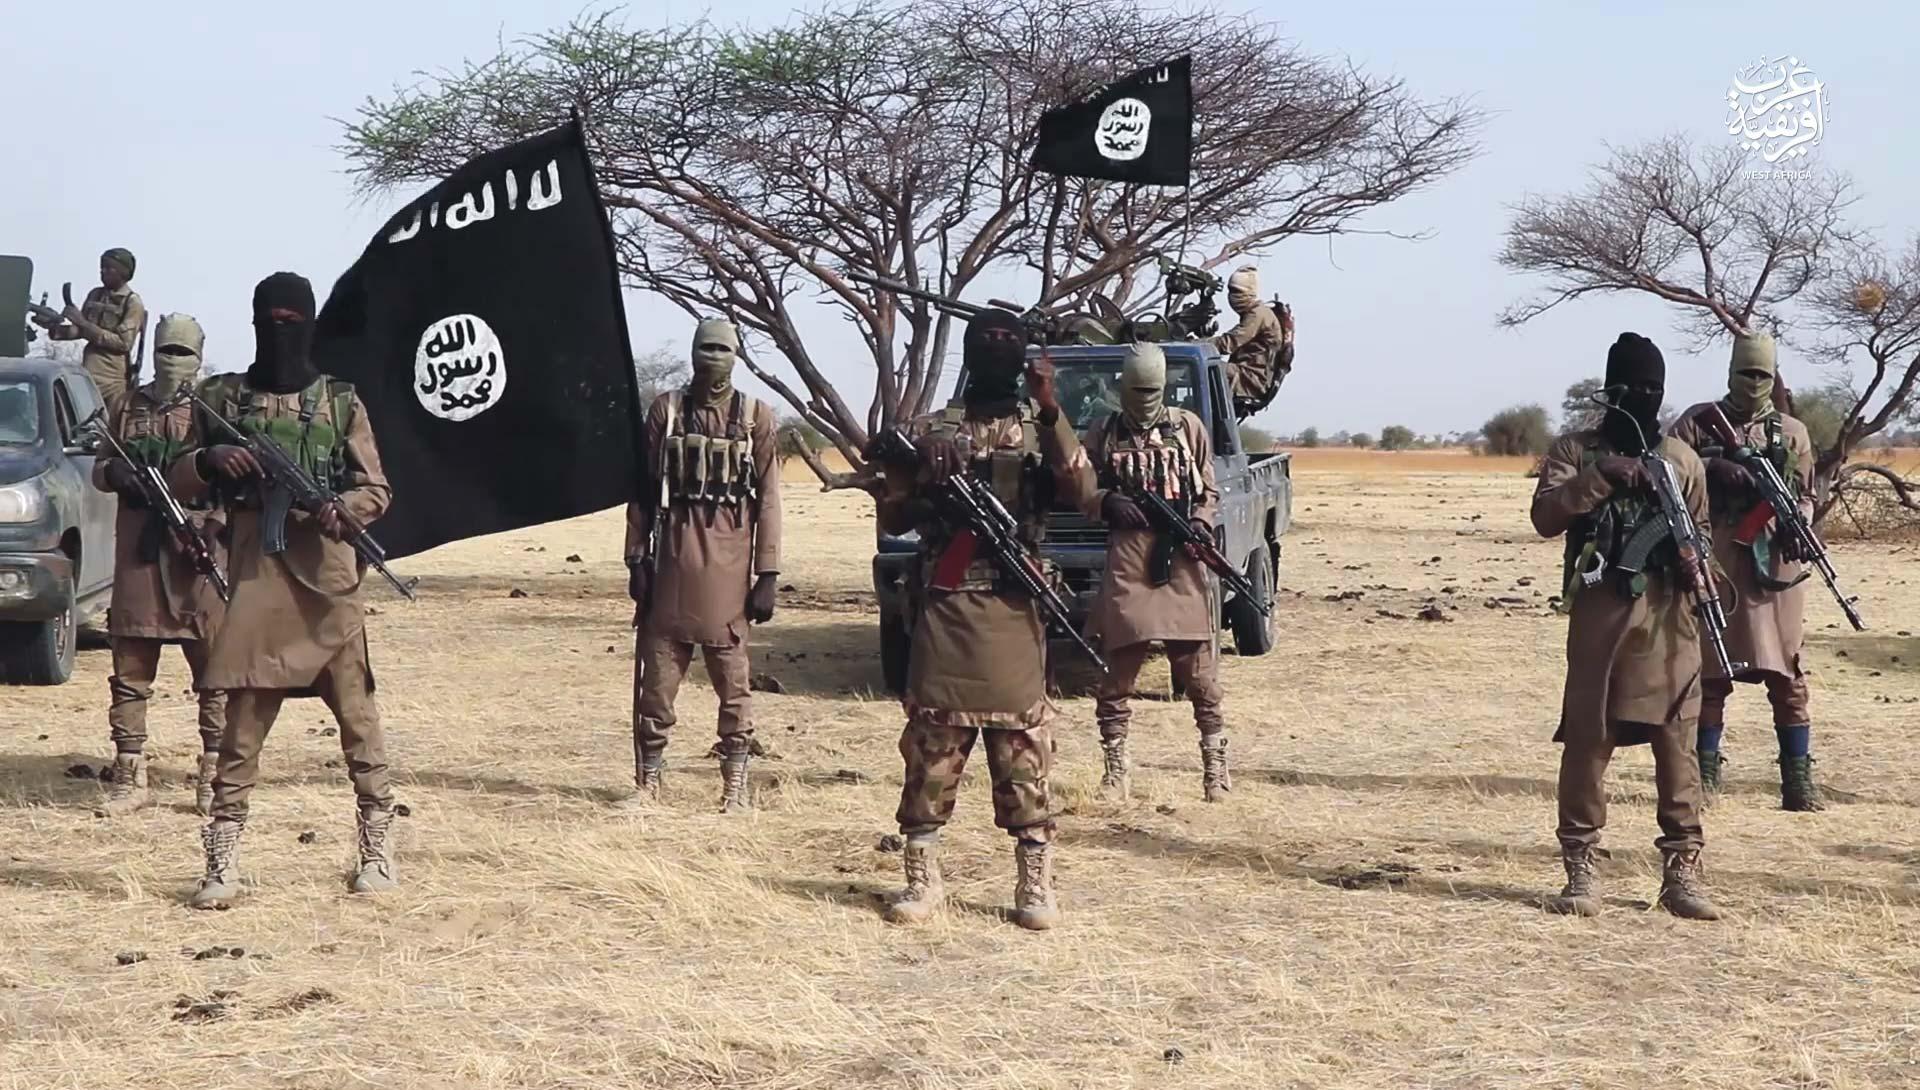 Boko Haram executes aid workers